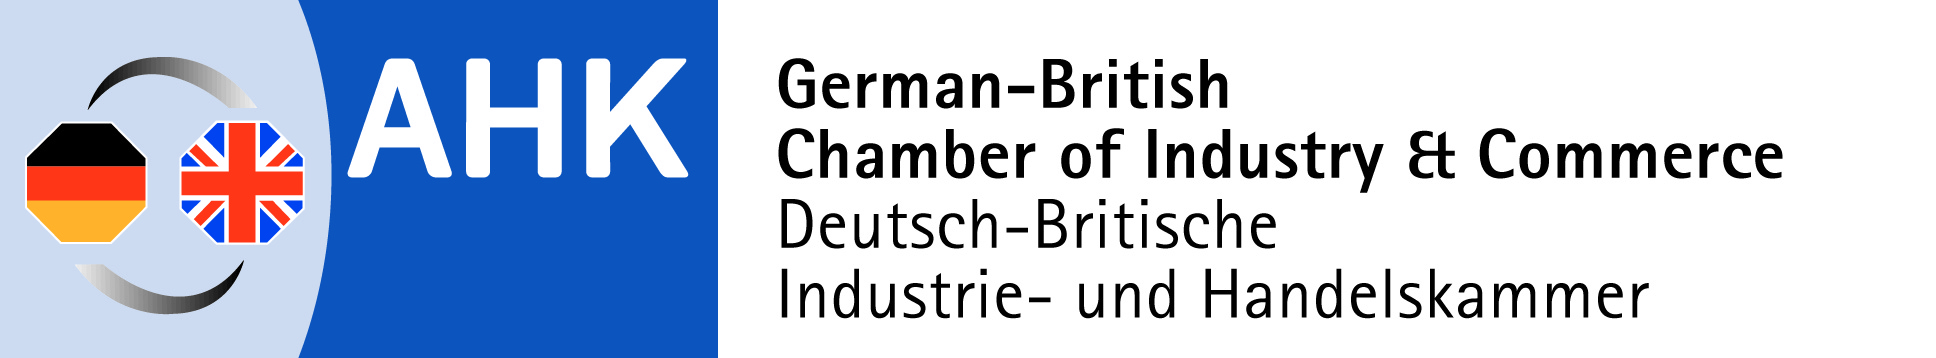 German-British+Chamber+logo+%28colour%29